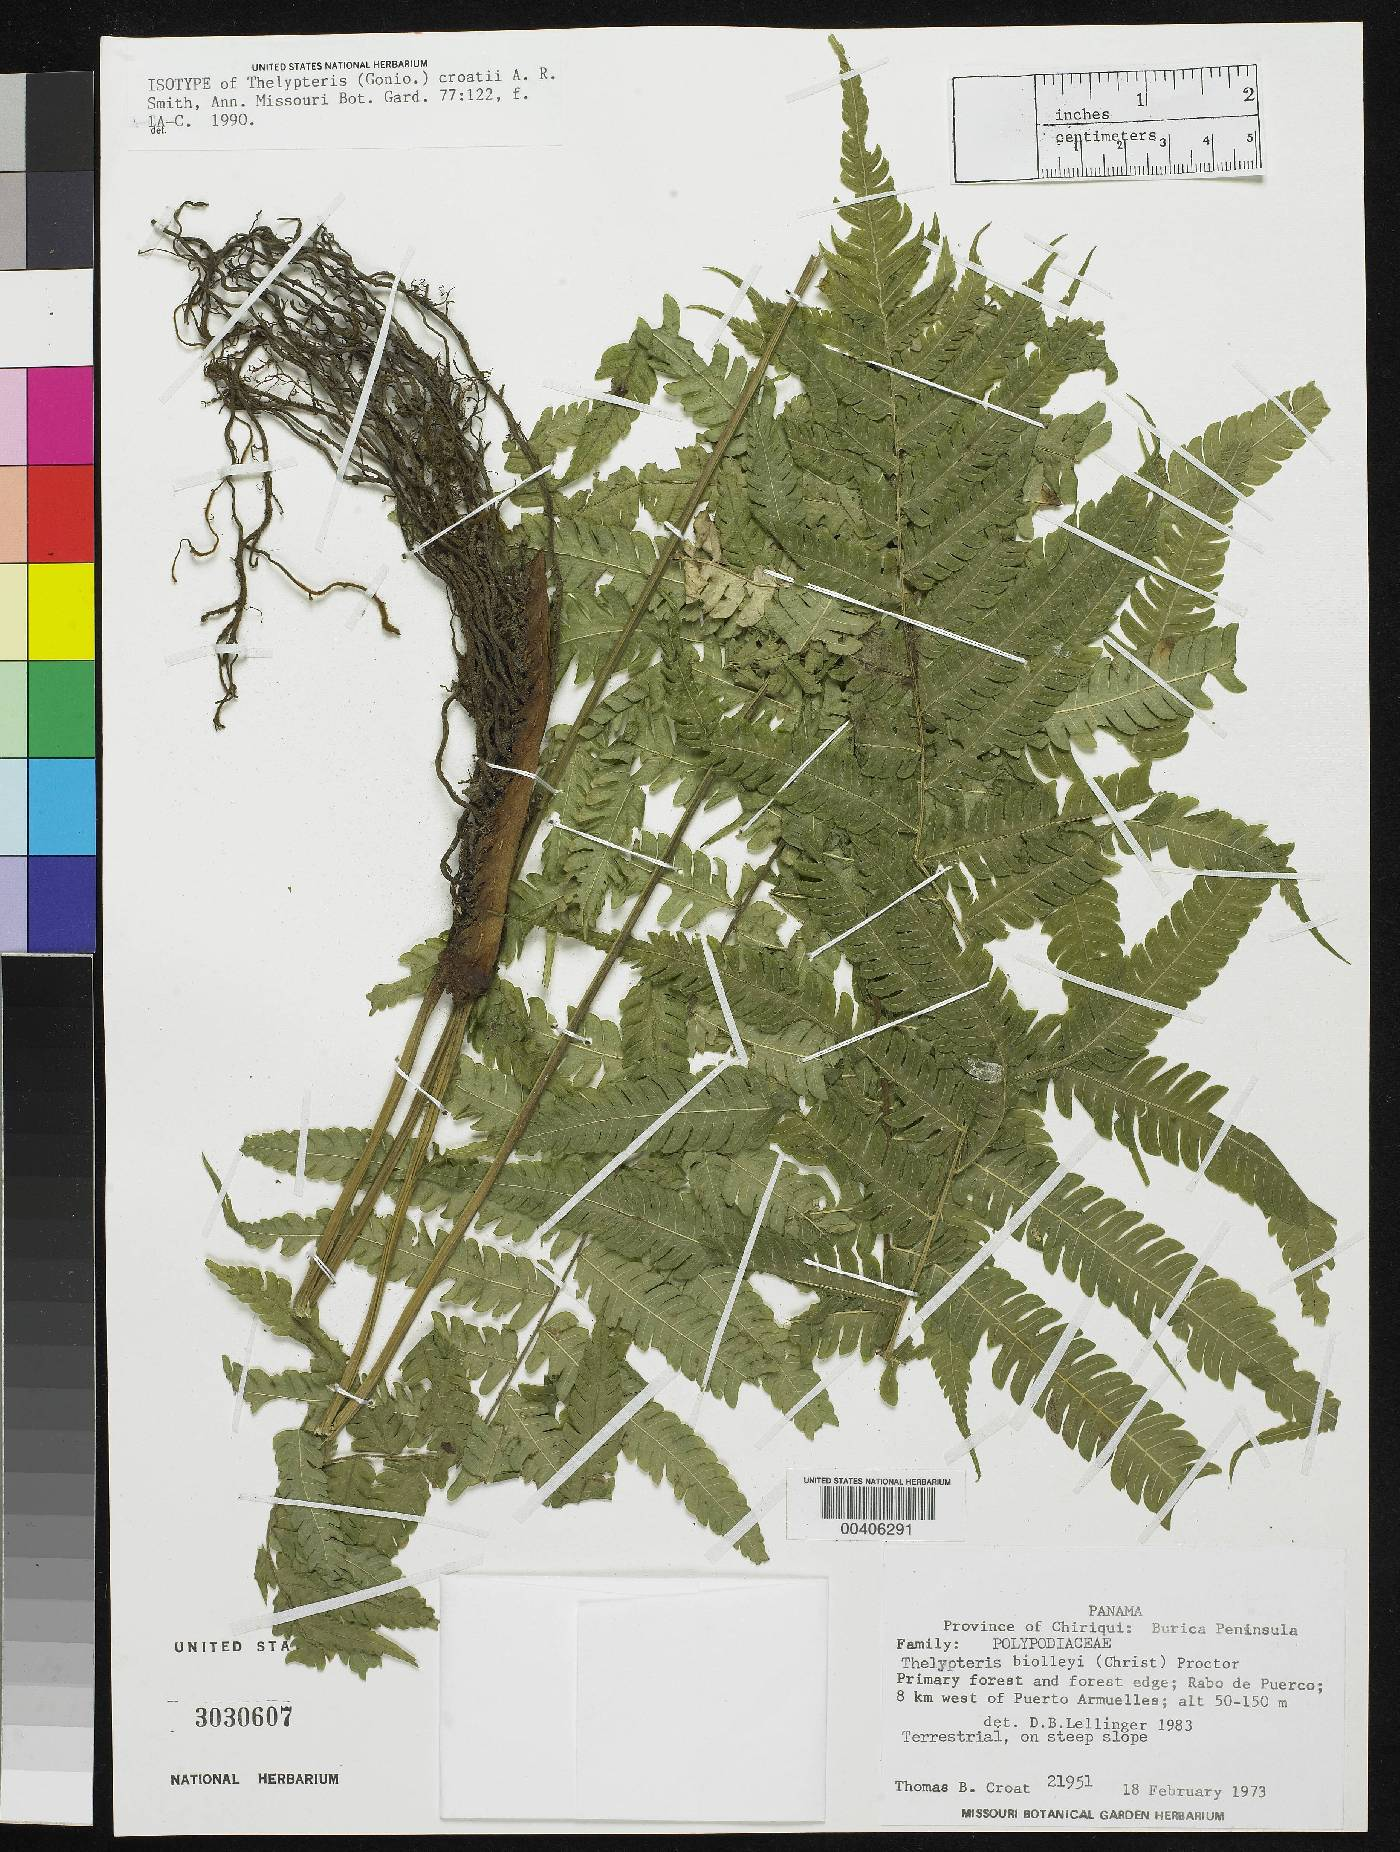 Thelypteris croatii image